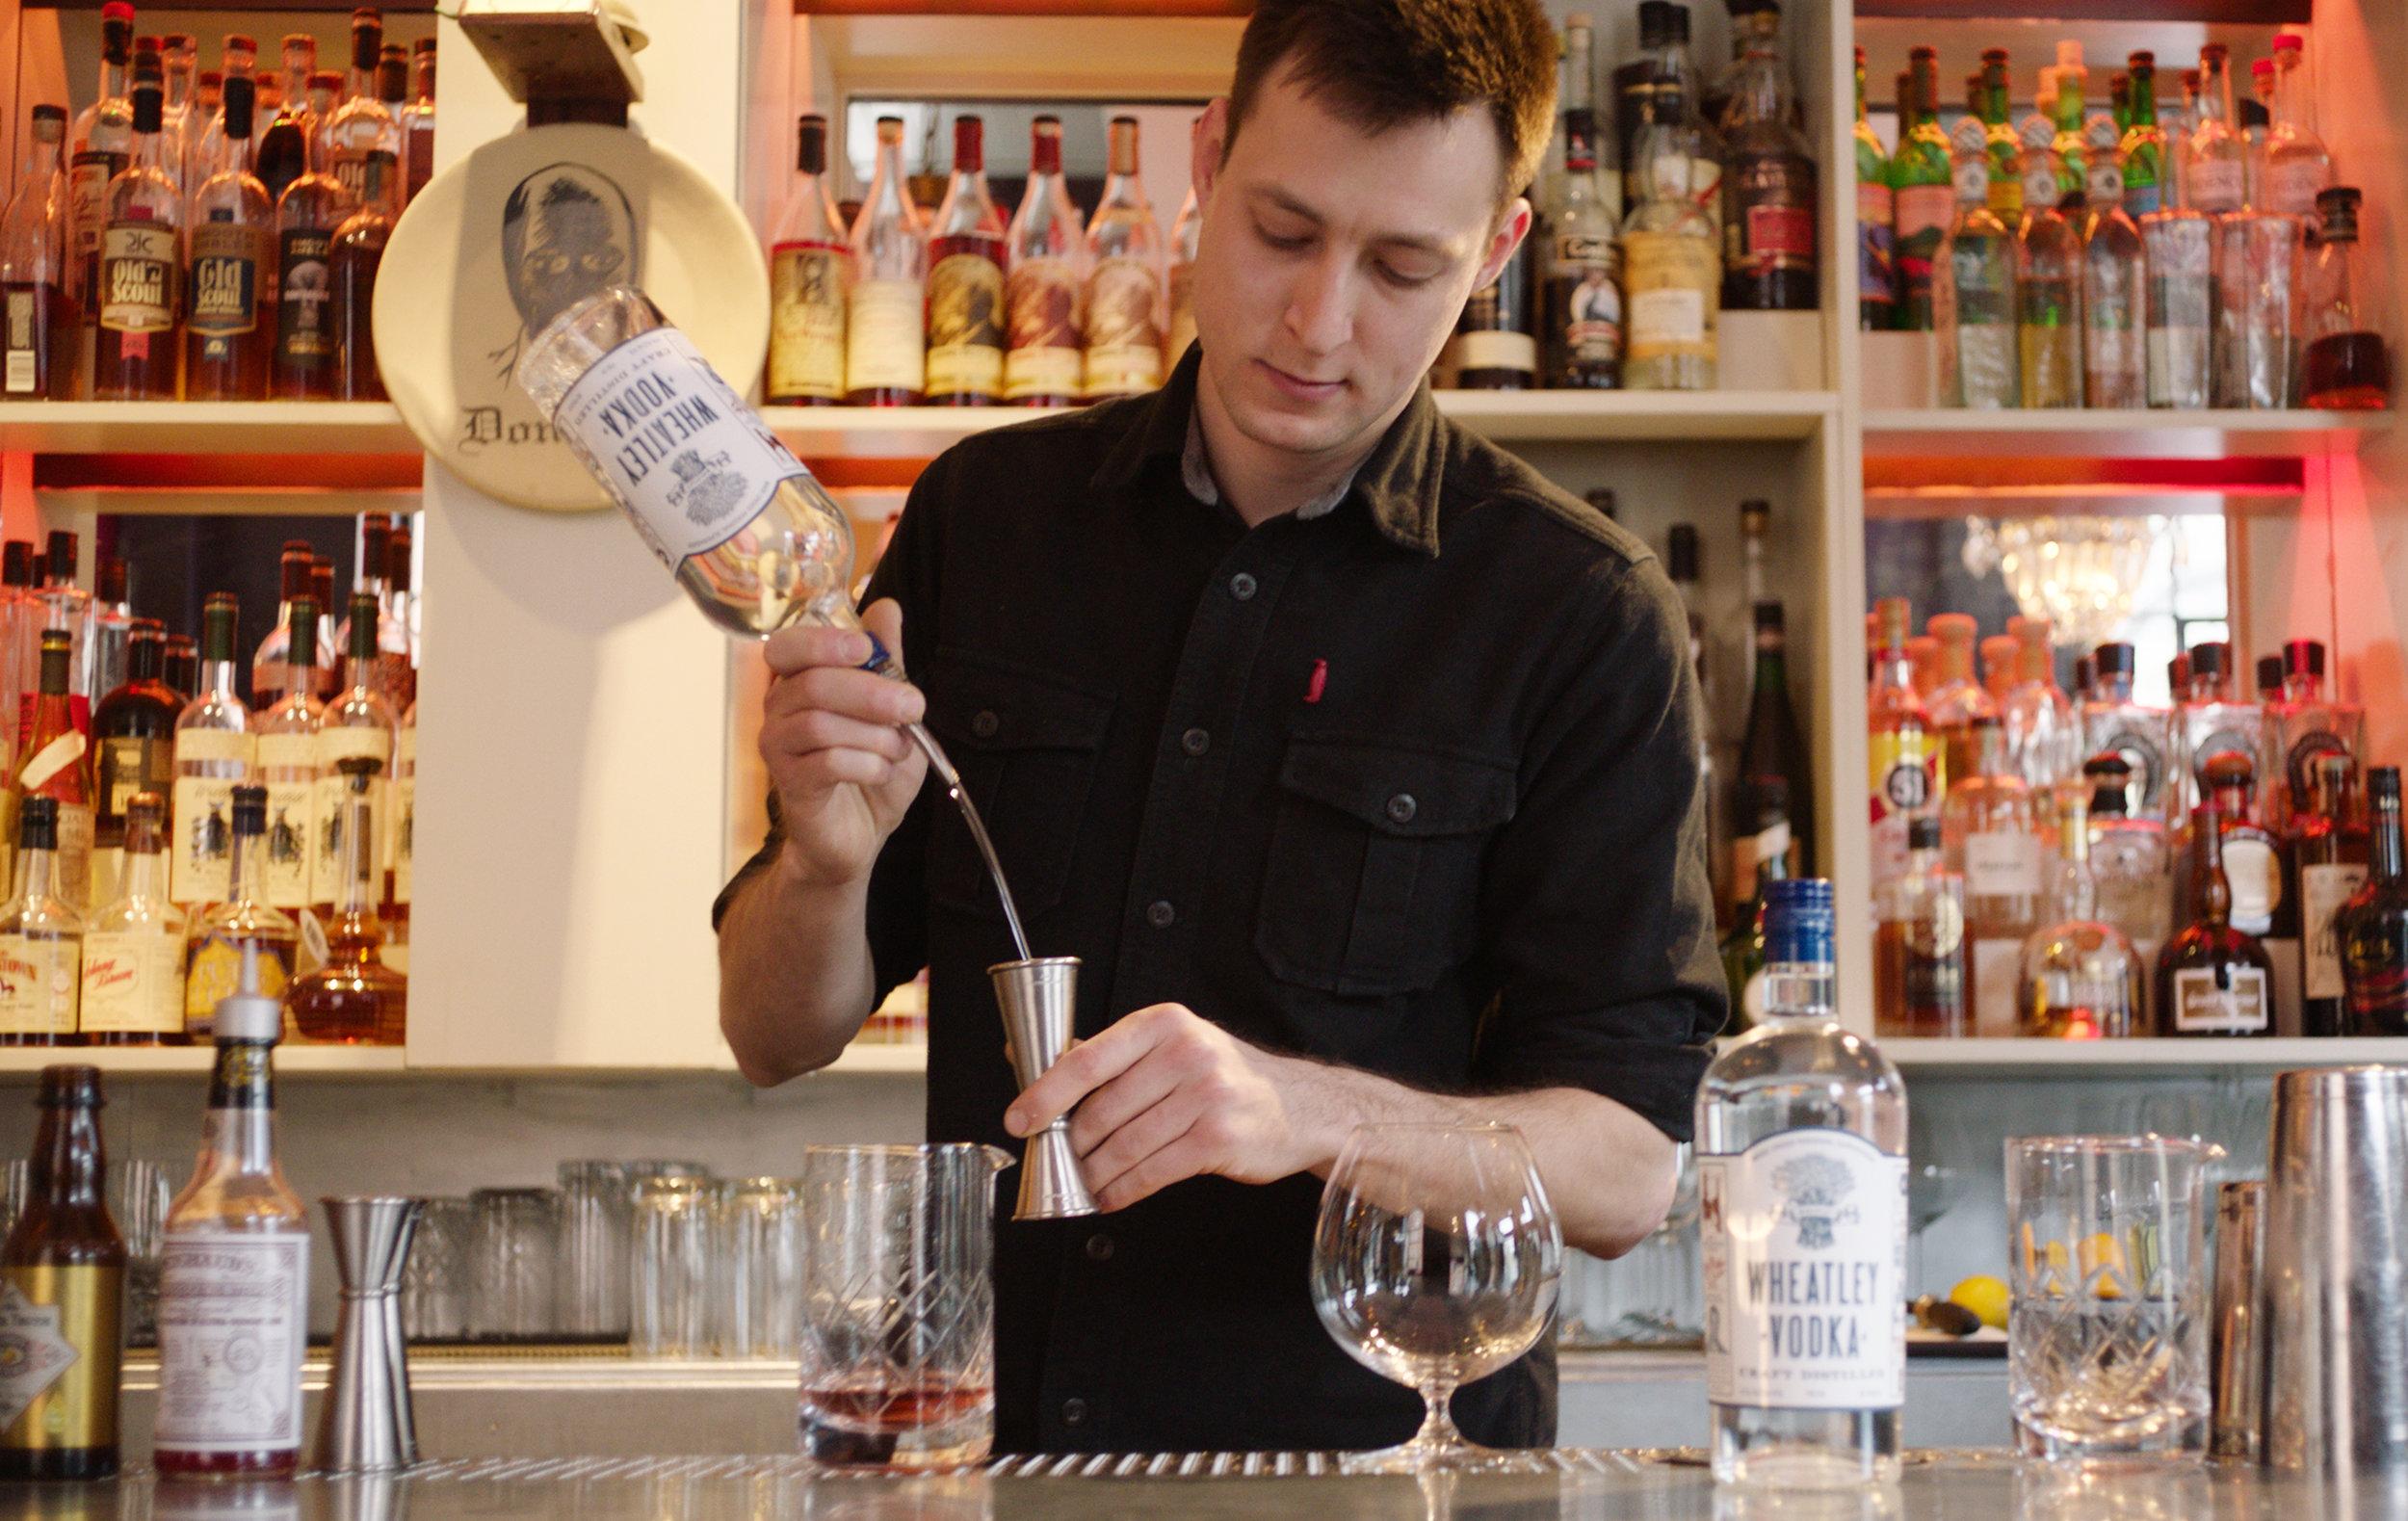 Proof on Main Bartender Greg Galganski standing behind his bar preparing a cocktail with Wheatley Vodka.